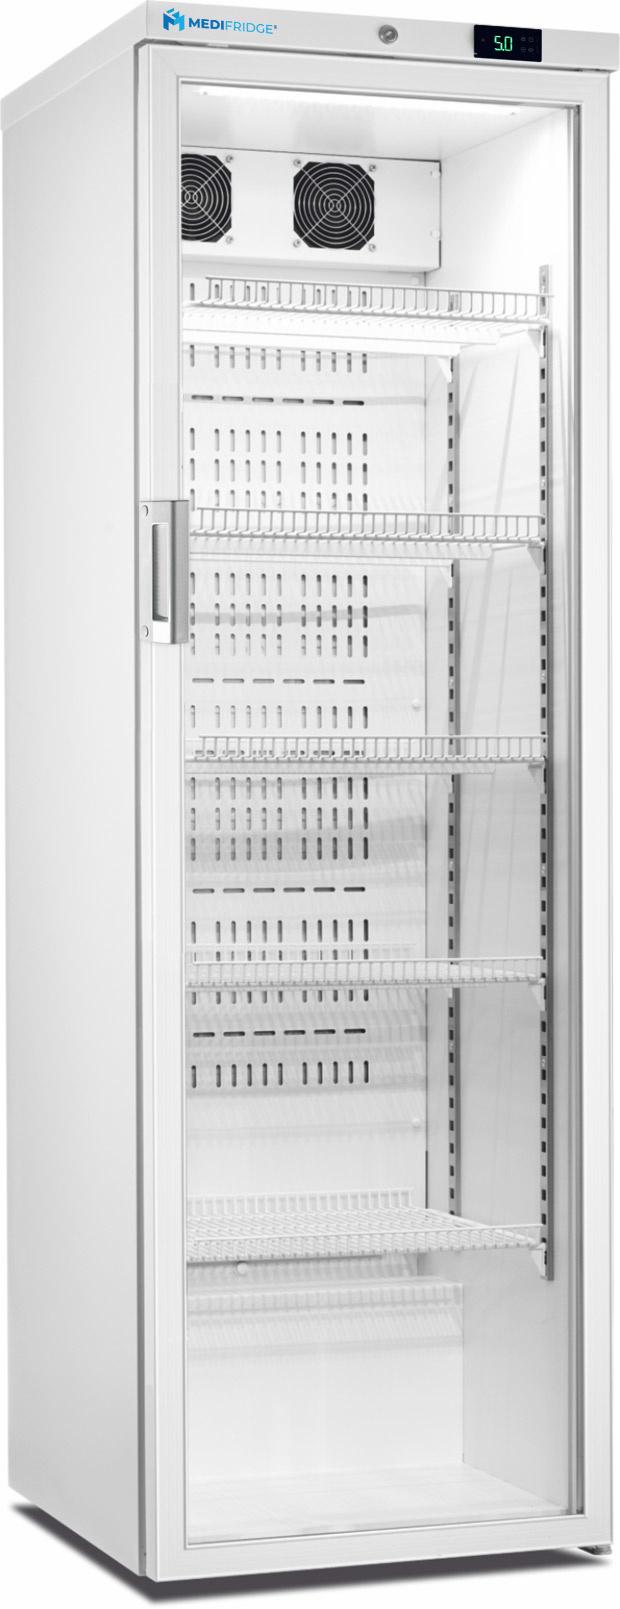 MediFridge Medikamentenkühlschrank MF450L-GD - Glastür - 416 Liter - 600x700x1875 mm - DIN 58345